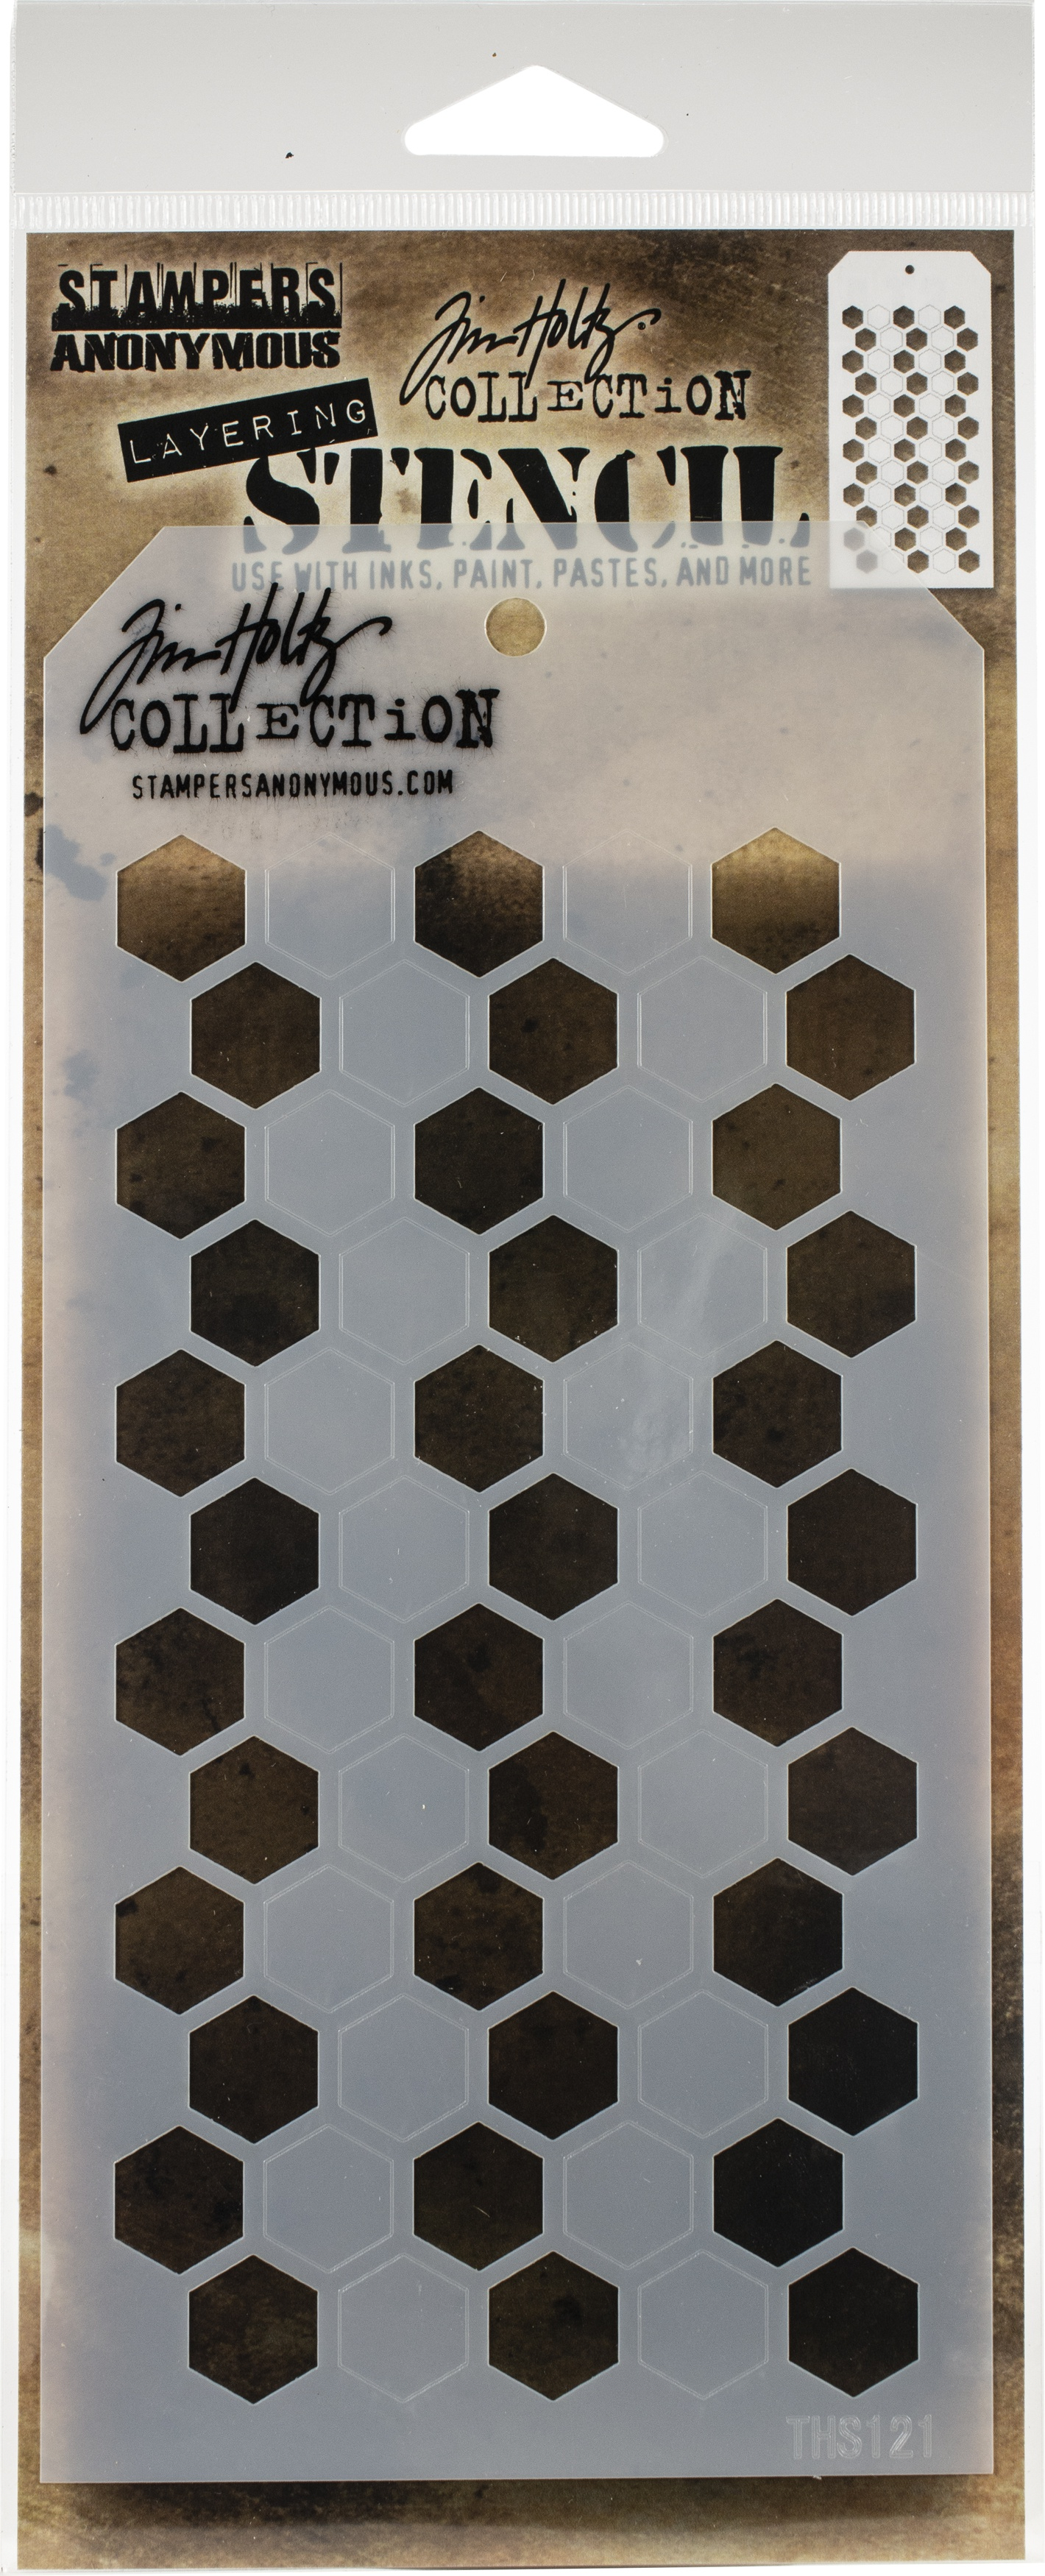 Tim Holtz Layered Stencil 4.125X8.5-Shifter Hex